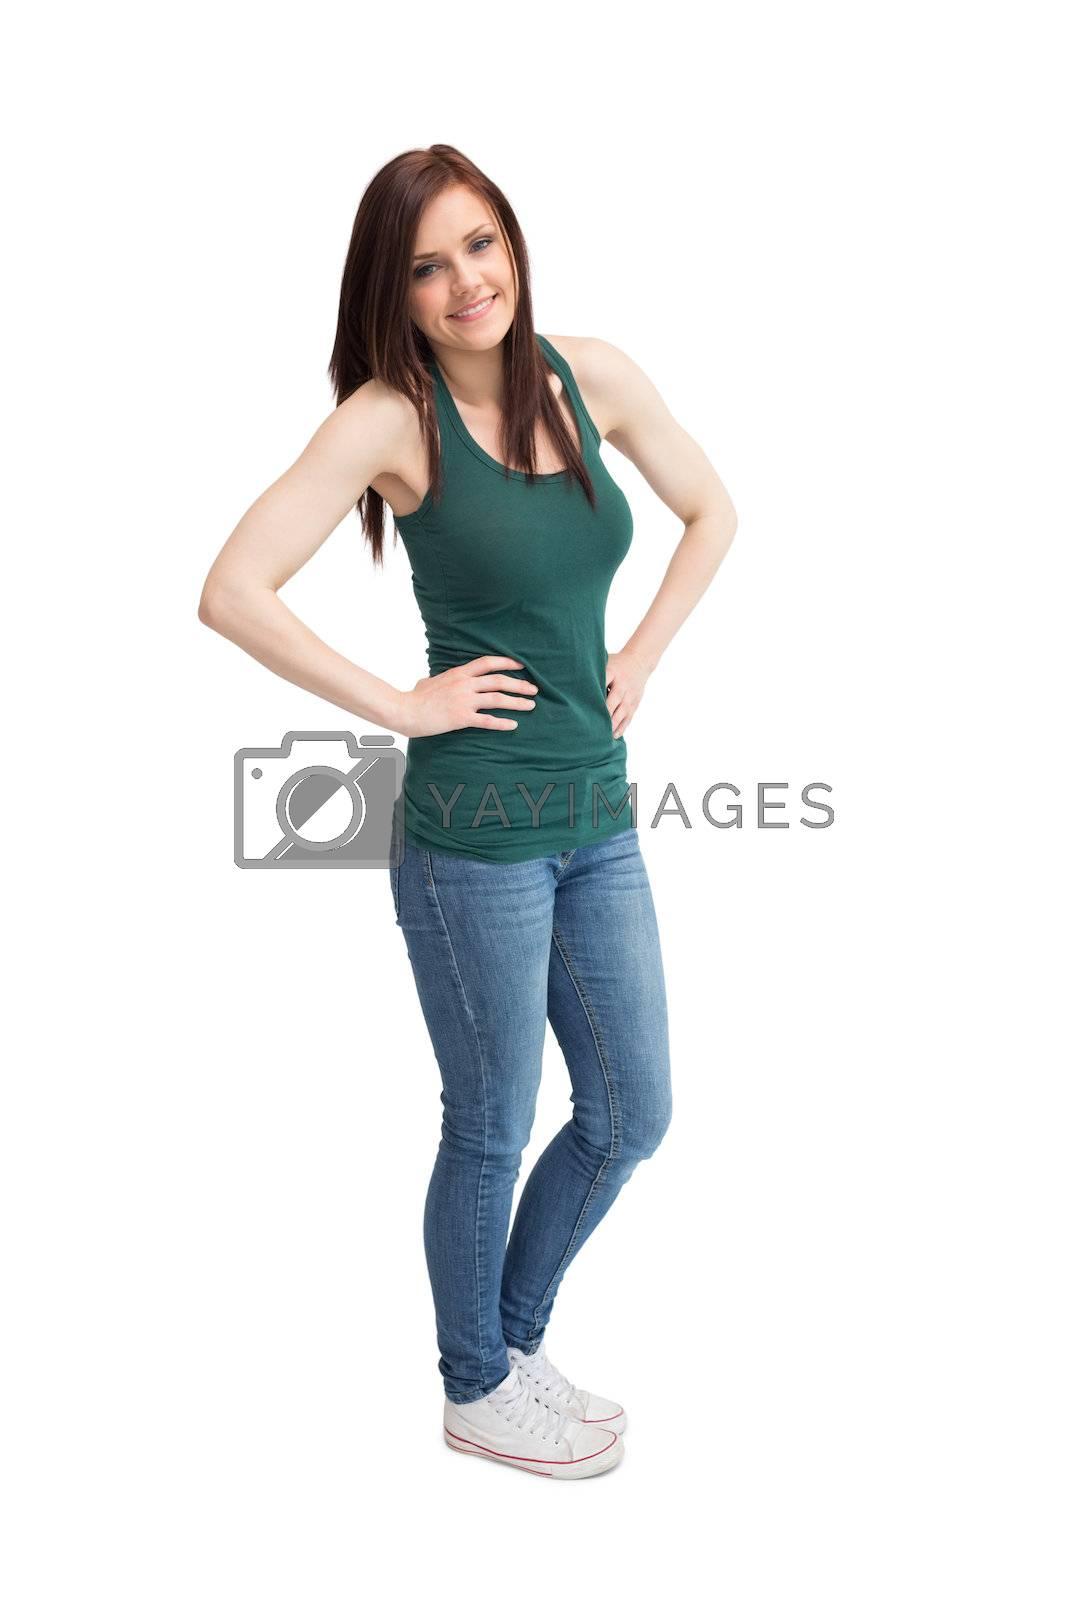 Cheerful casual woman posing by Wavebreakmedia